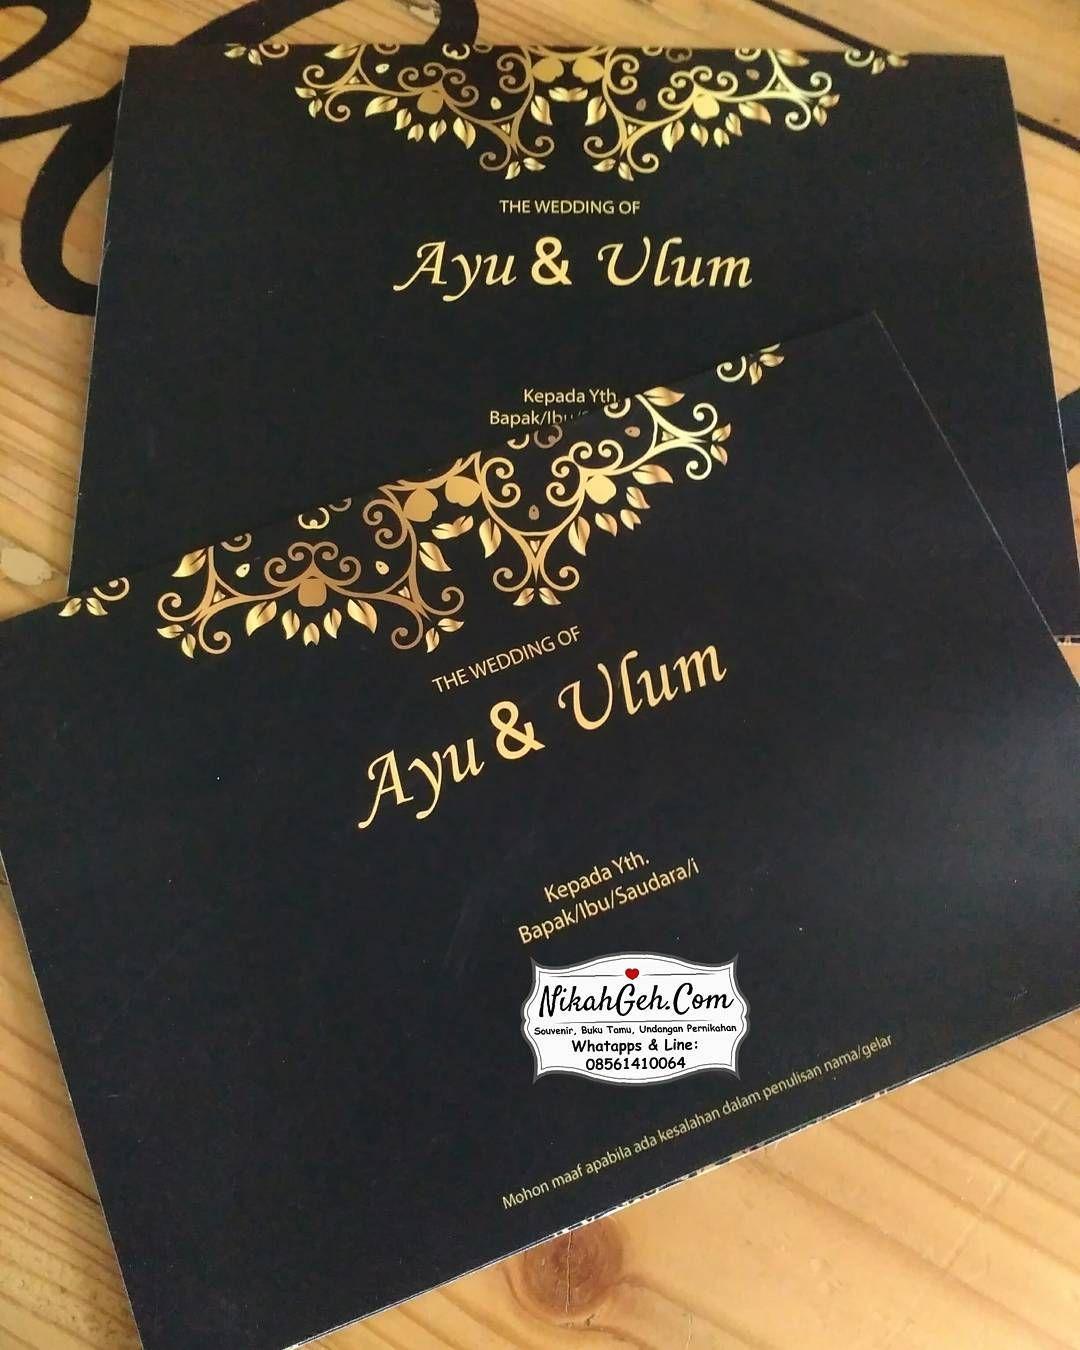 Format Nama Undangan Pernikahan : format, undangan, pernikahan, Https://nikahgeh.com, Wedding, Invitation, Tanya-tanya, Lebih, Lanj…, Sample,, Muslim, Invitations,, Design